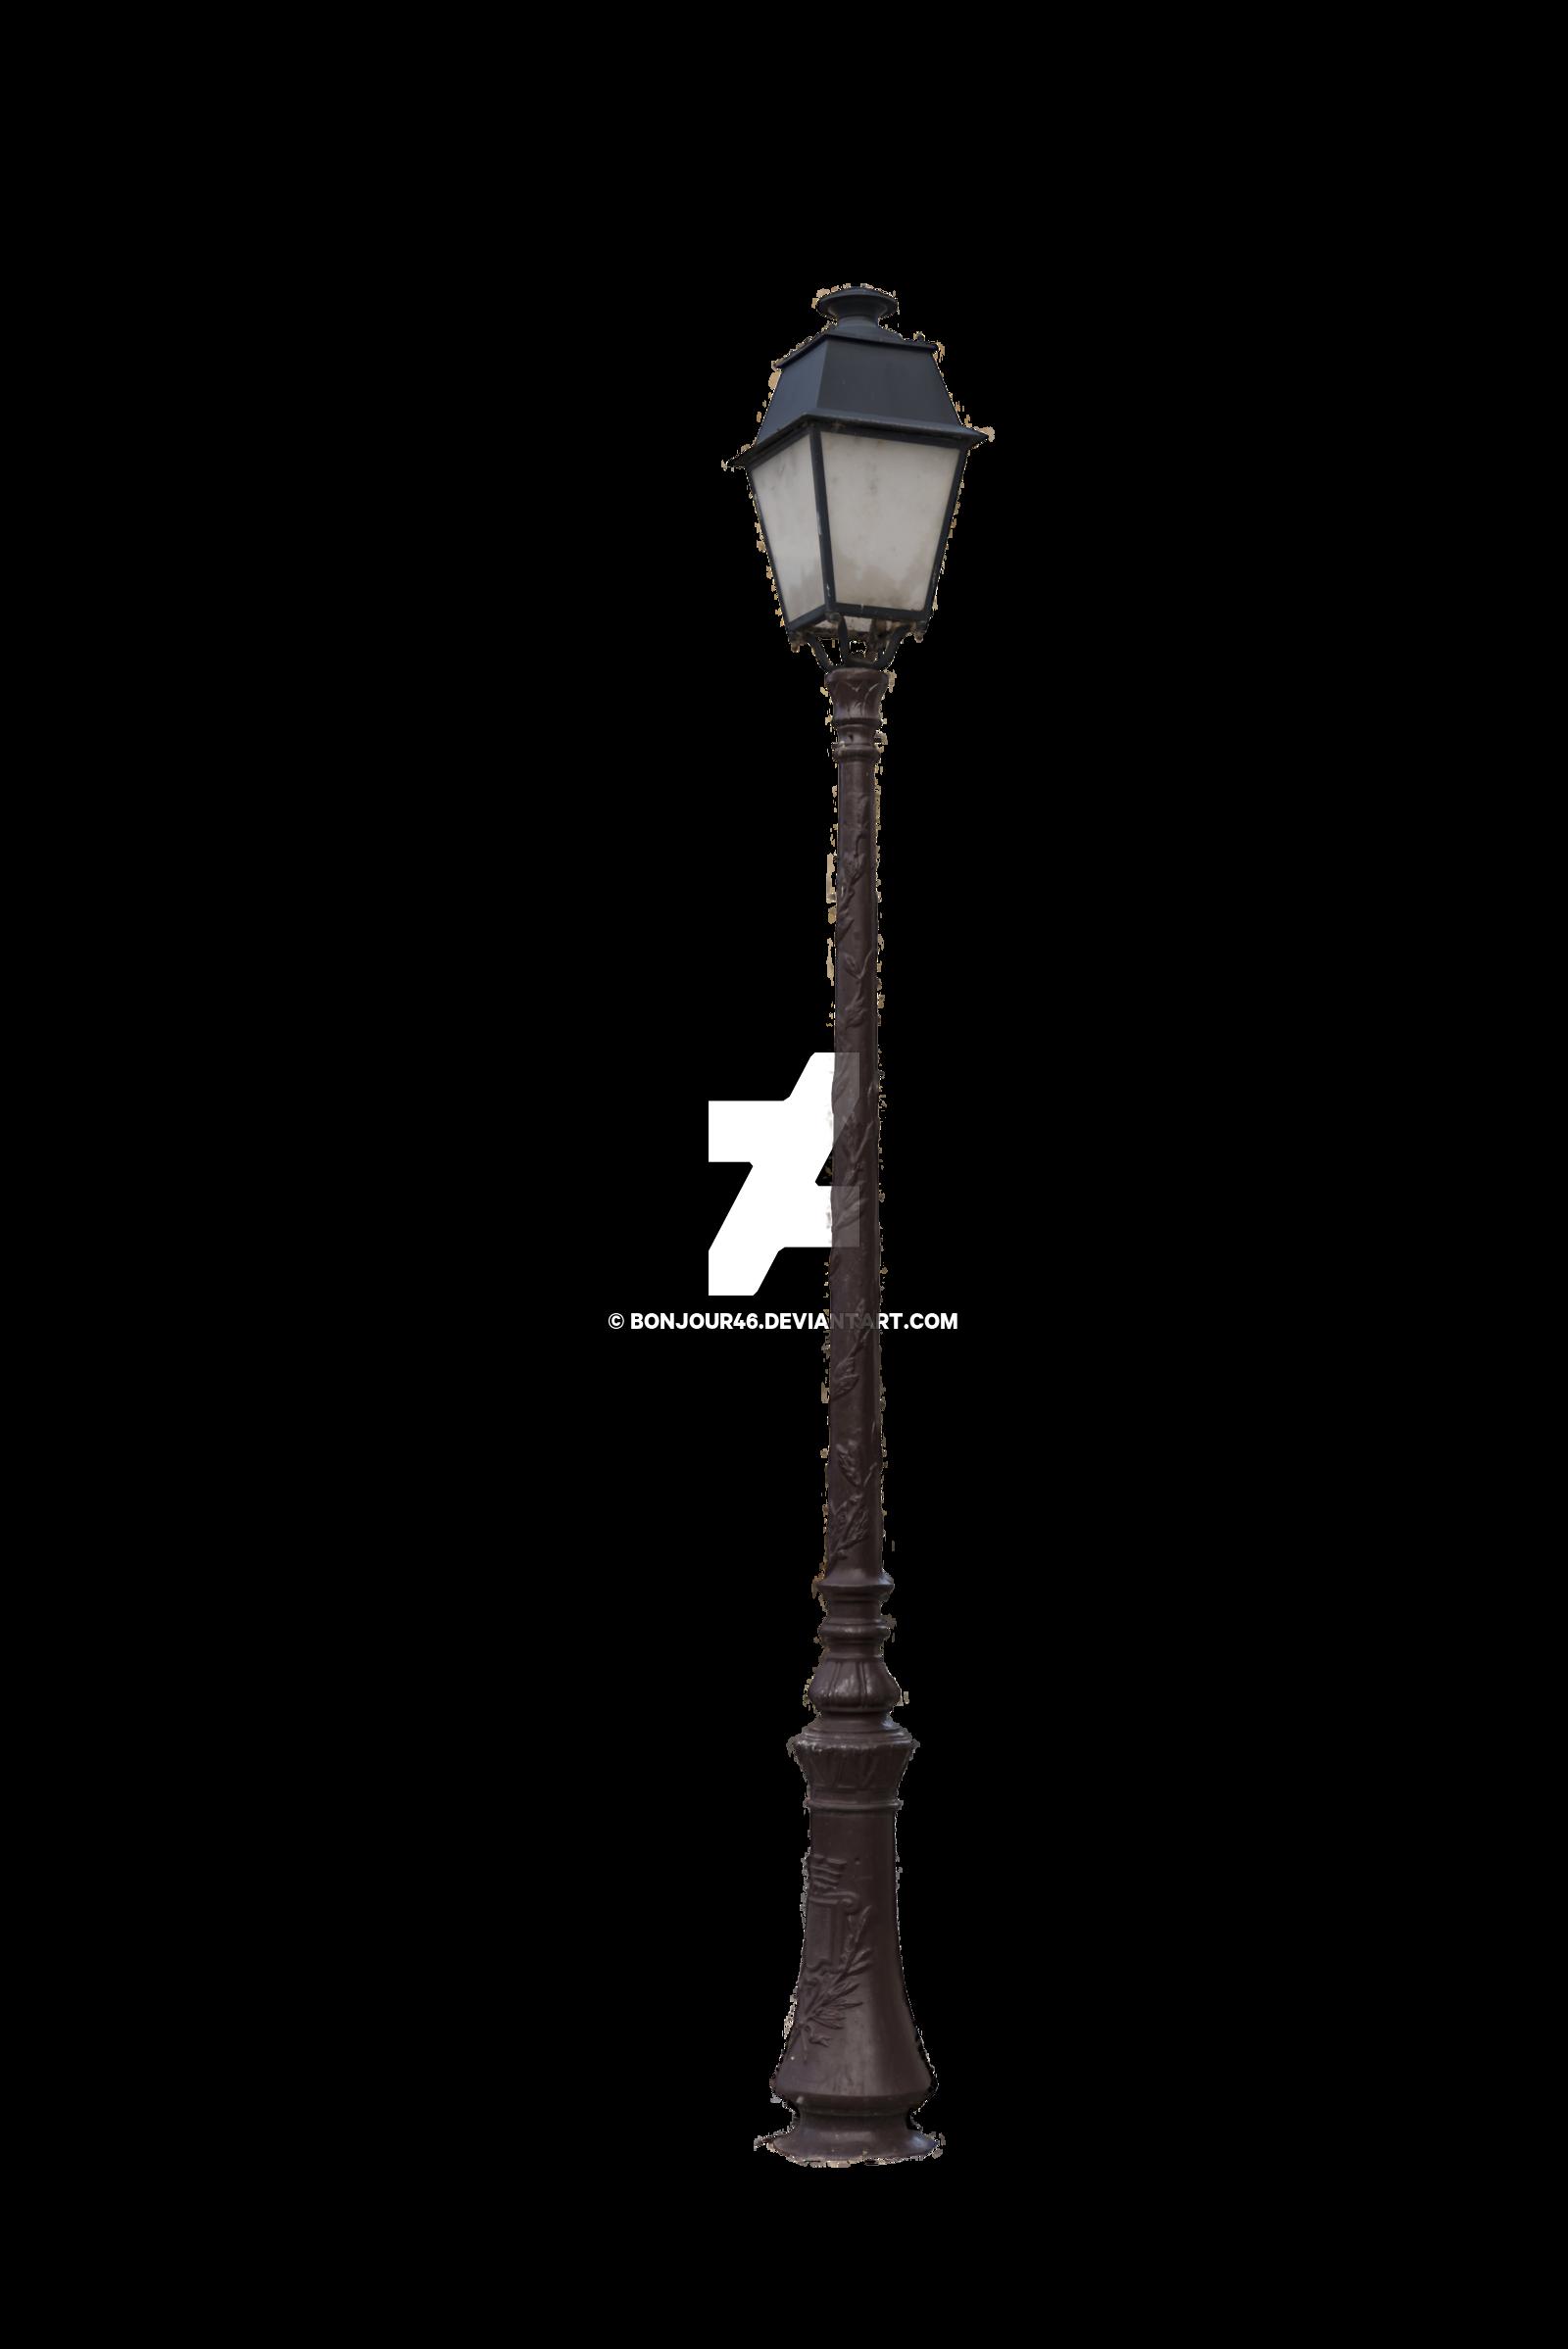 paris clipart lamp post